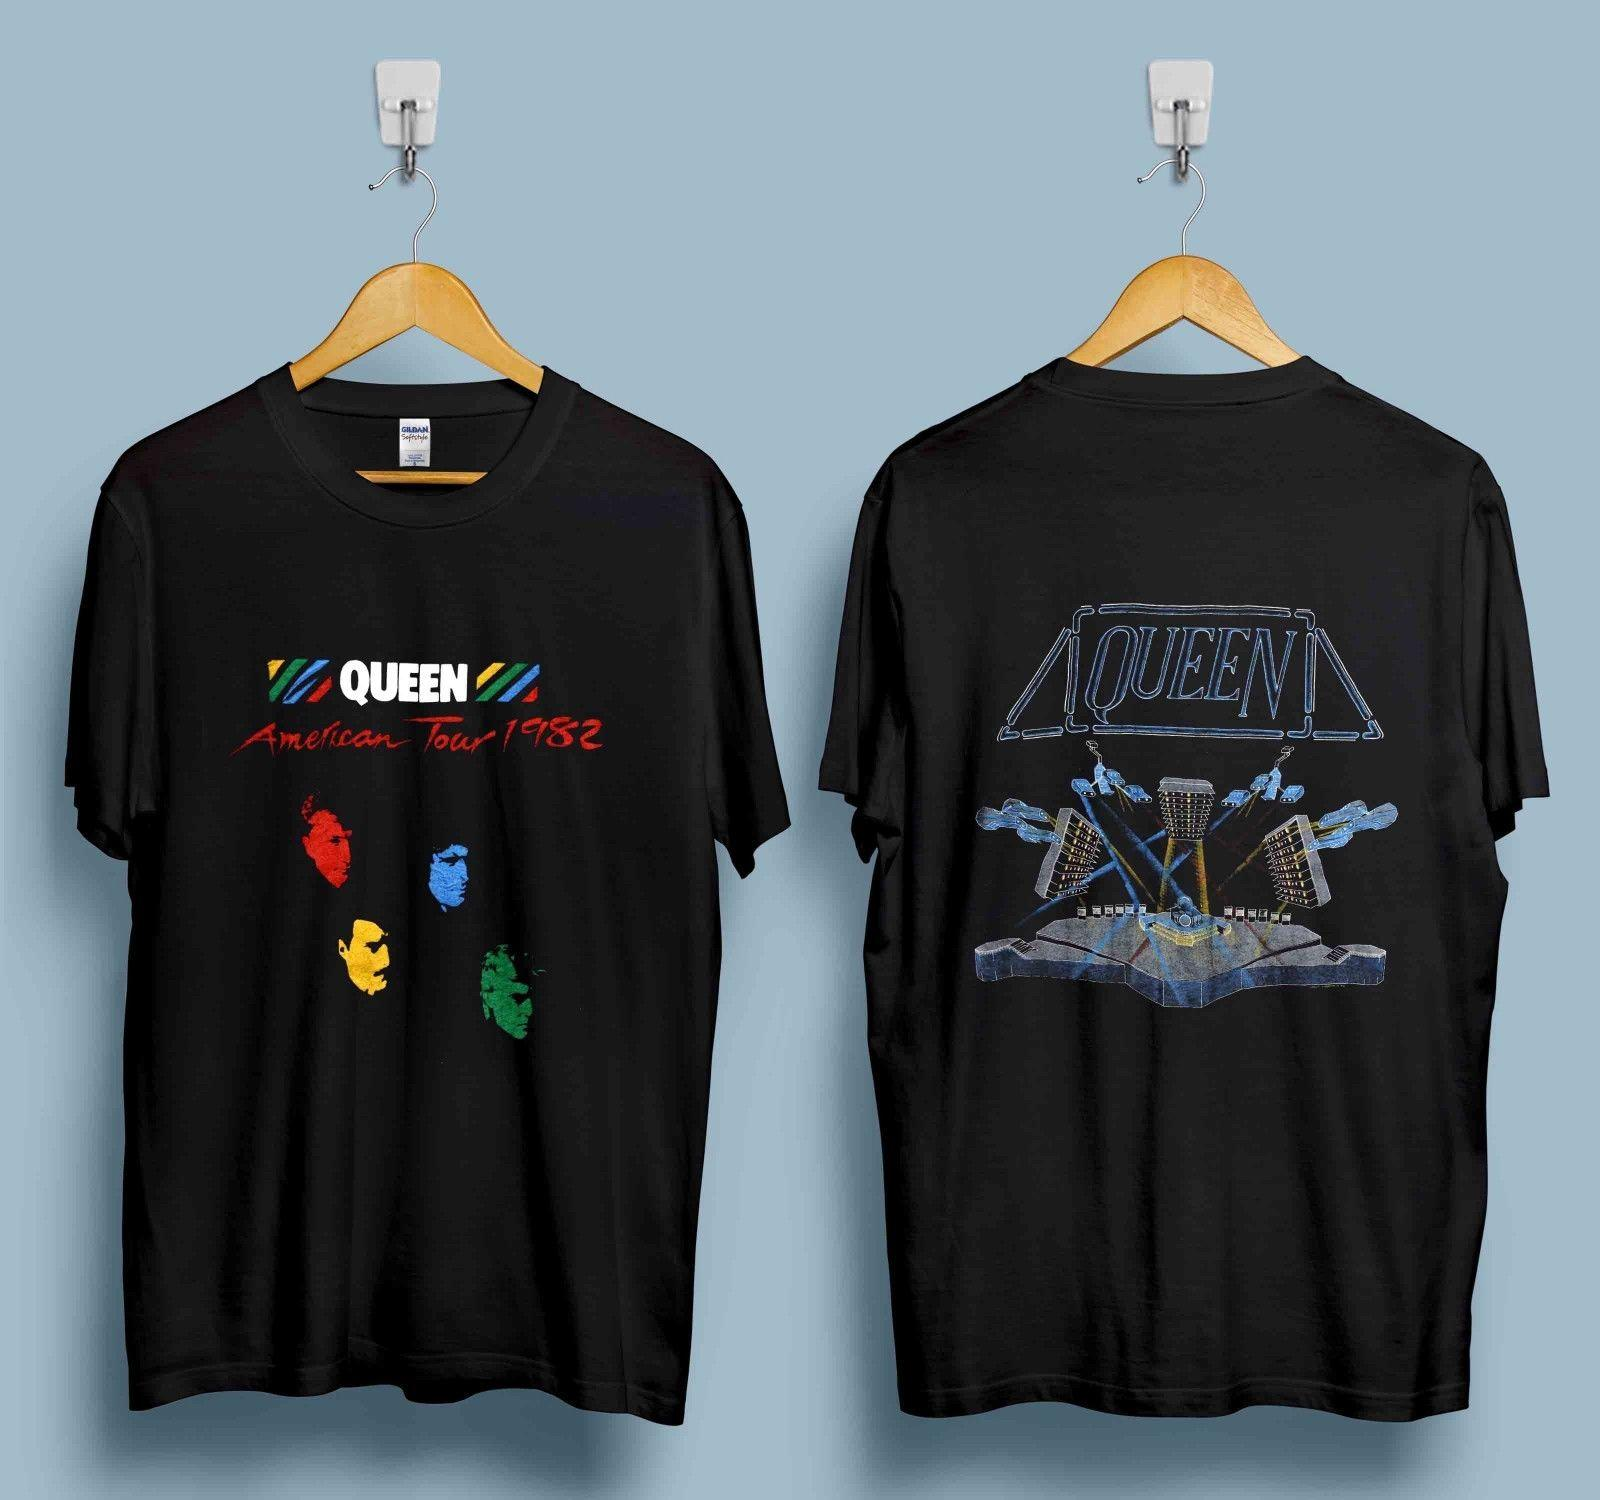 b3ab8e97eb Vintage Queen Tshirt 1982 Hot Space Tour Glam Rock Band Freddie Mercury  Reprint Hot 2019 Summer Men's T Shirt Fashion